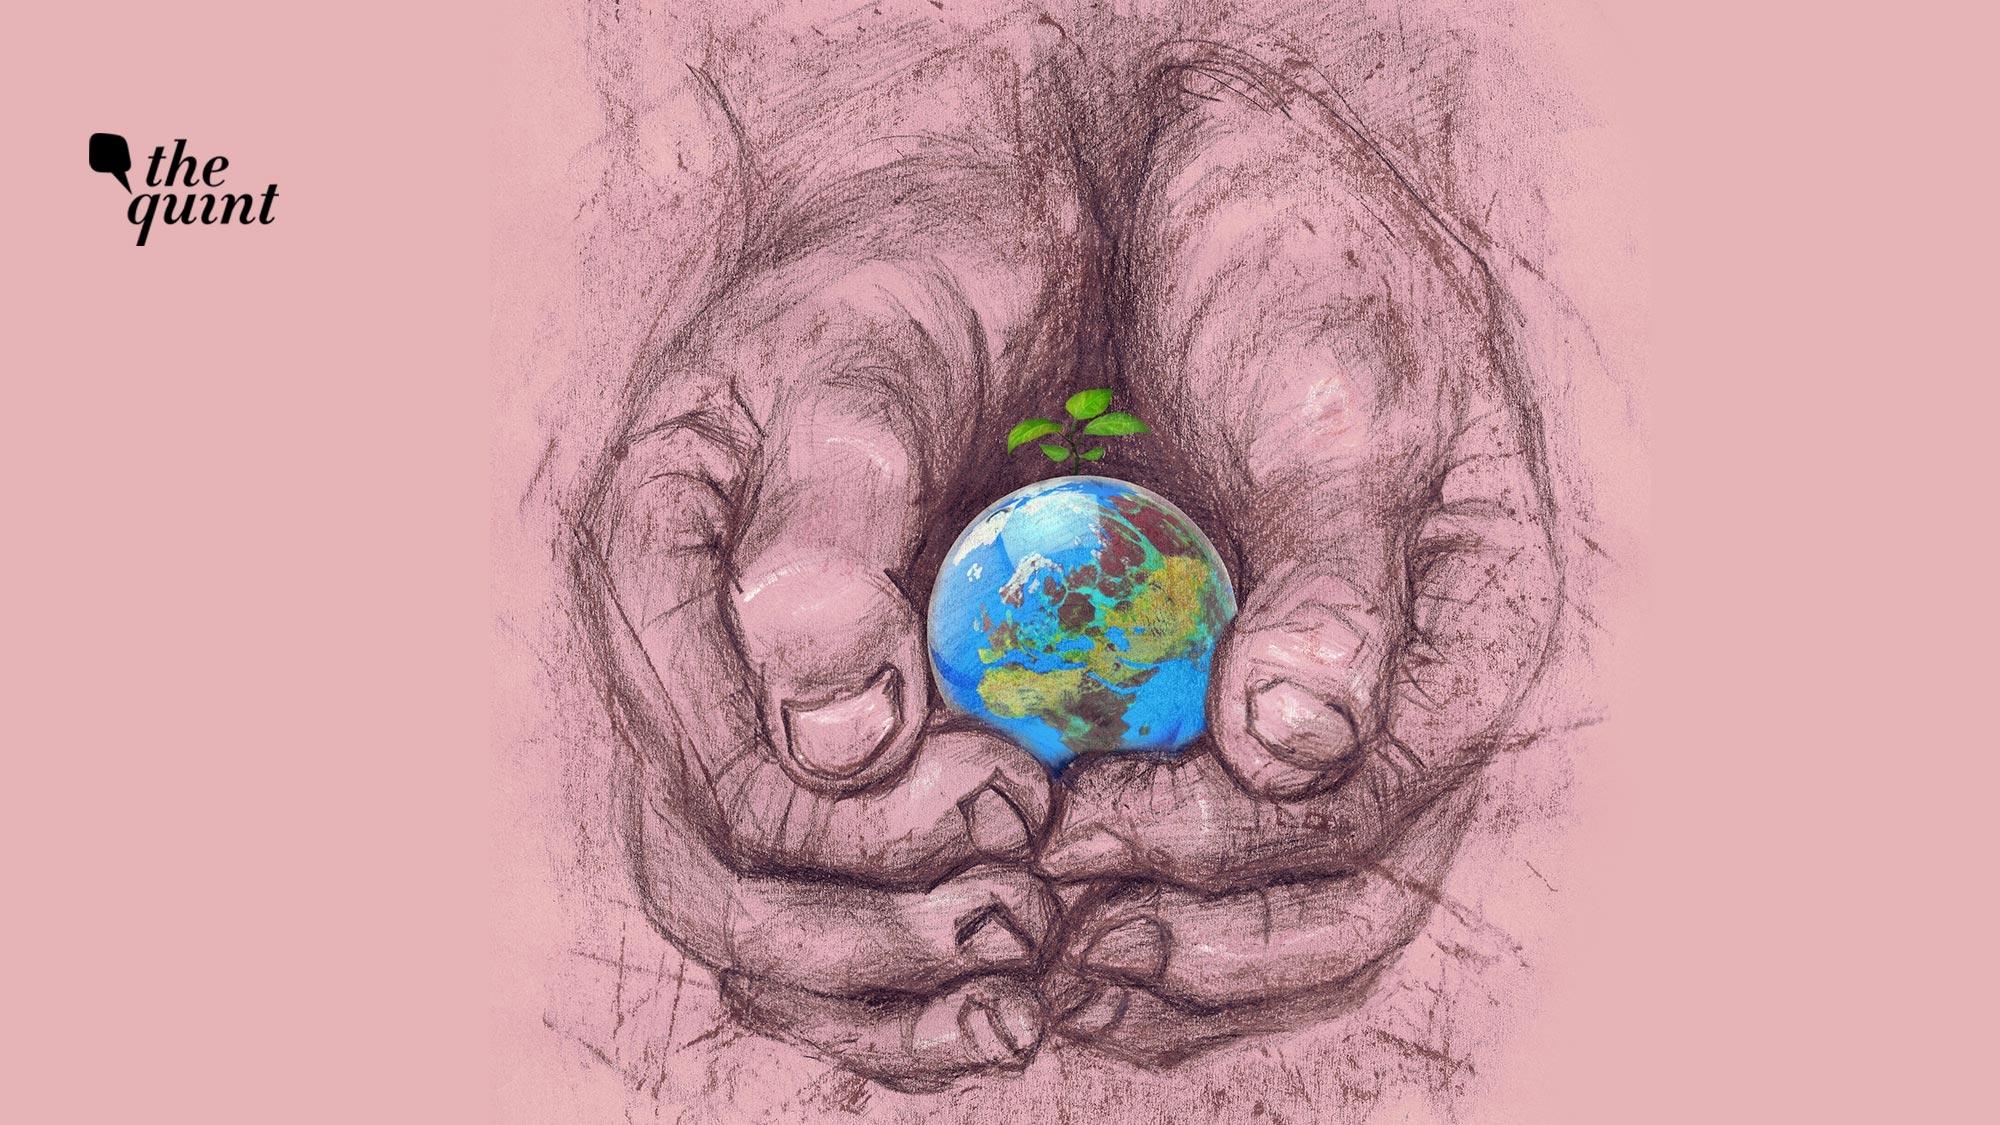 Coronavirus Lockdown: Dear World, Mother Nature Has a Message